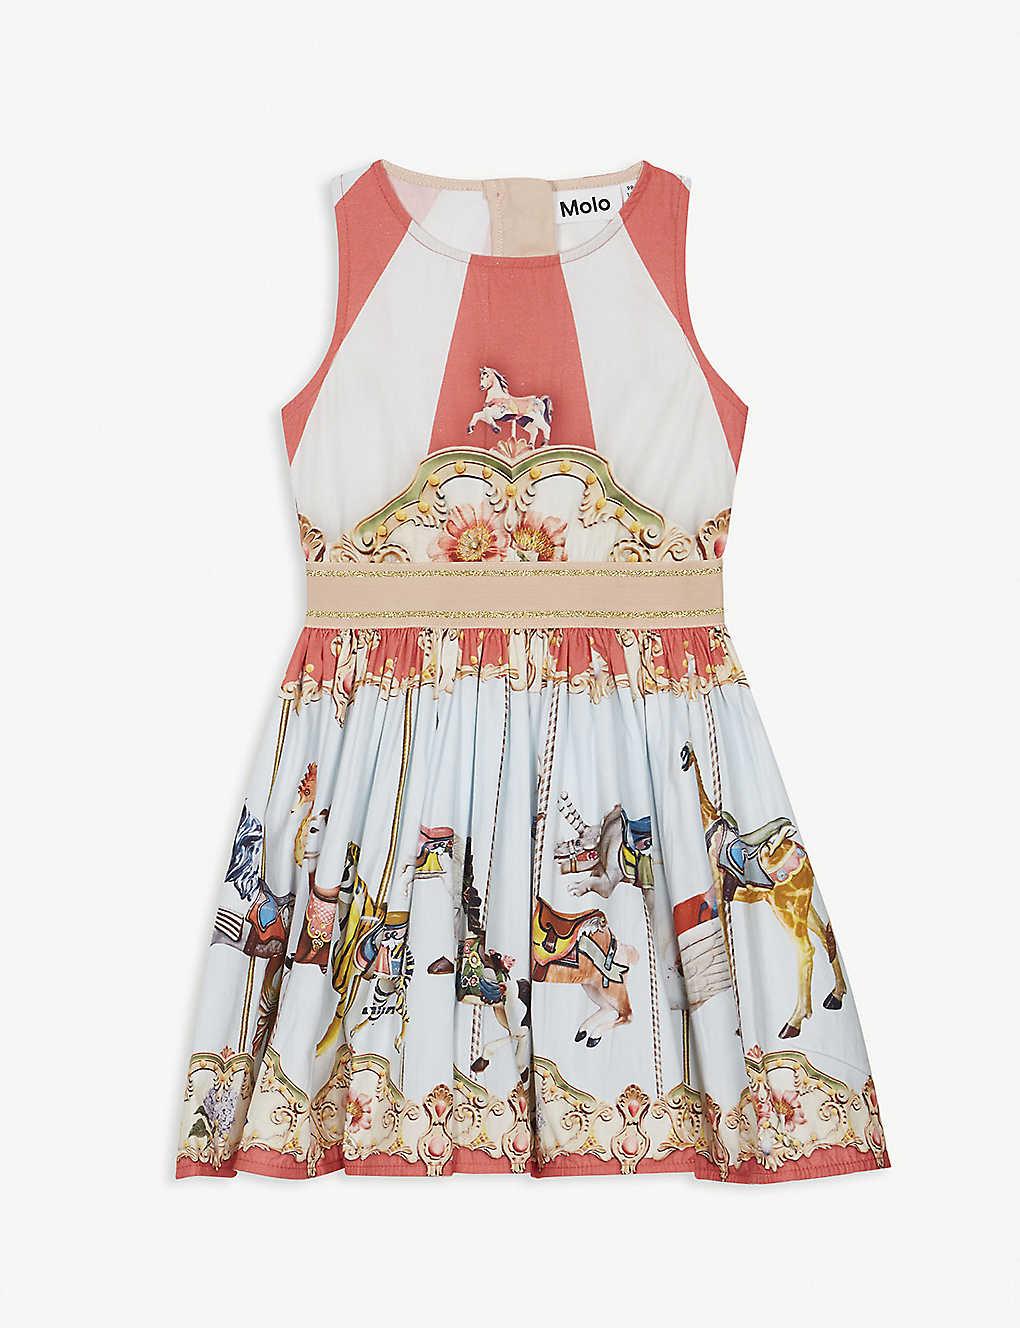 61d28b8c7f04 MOLO - Carousel print dress 3-14 years